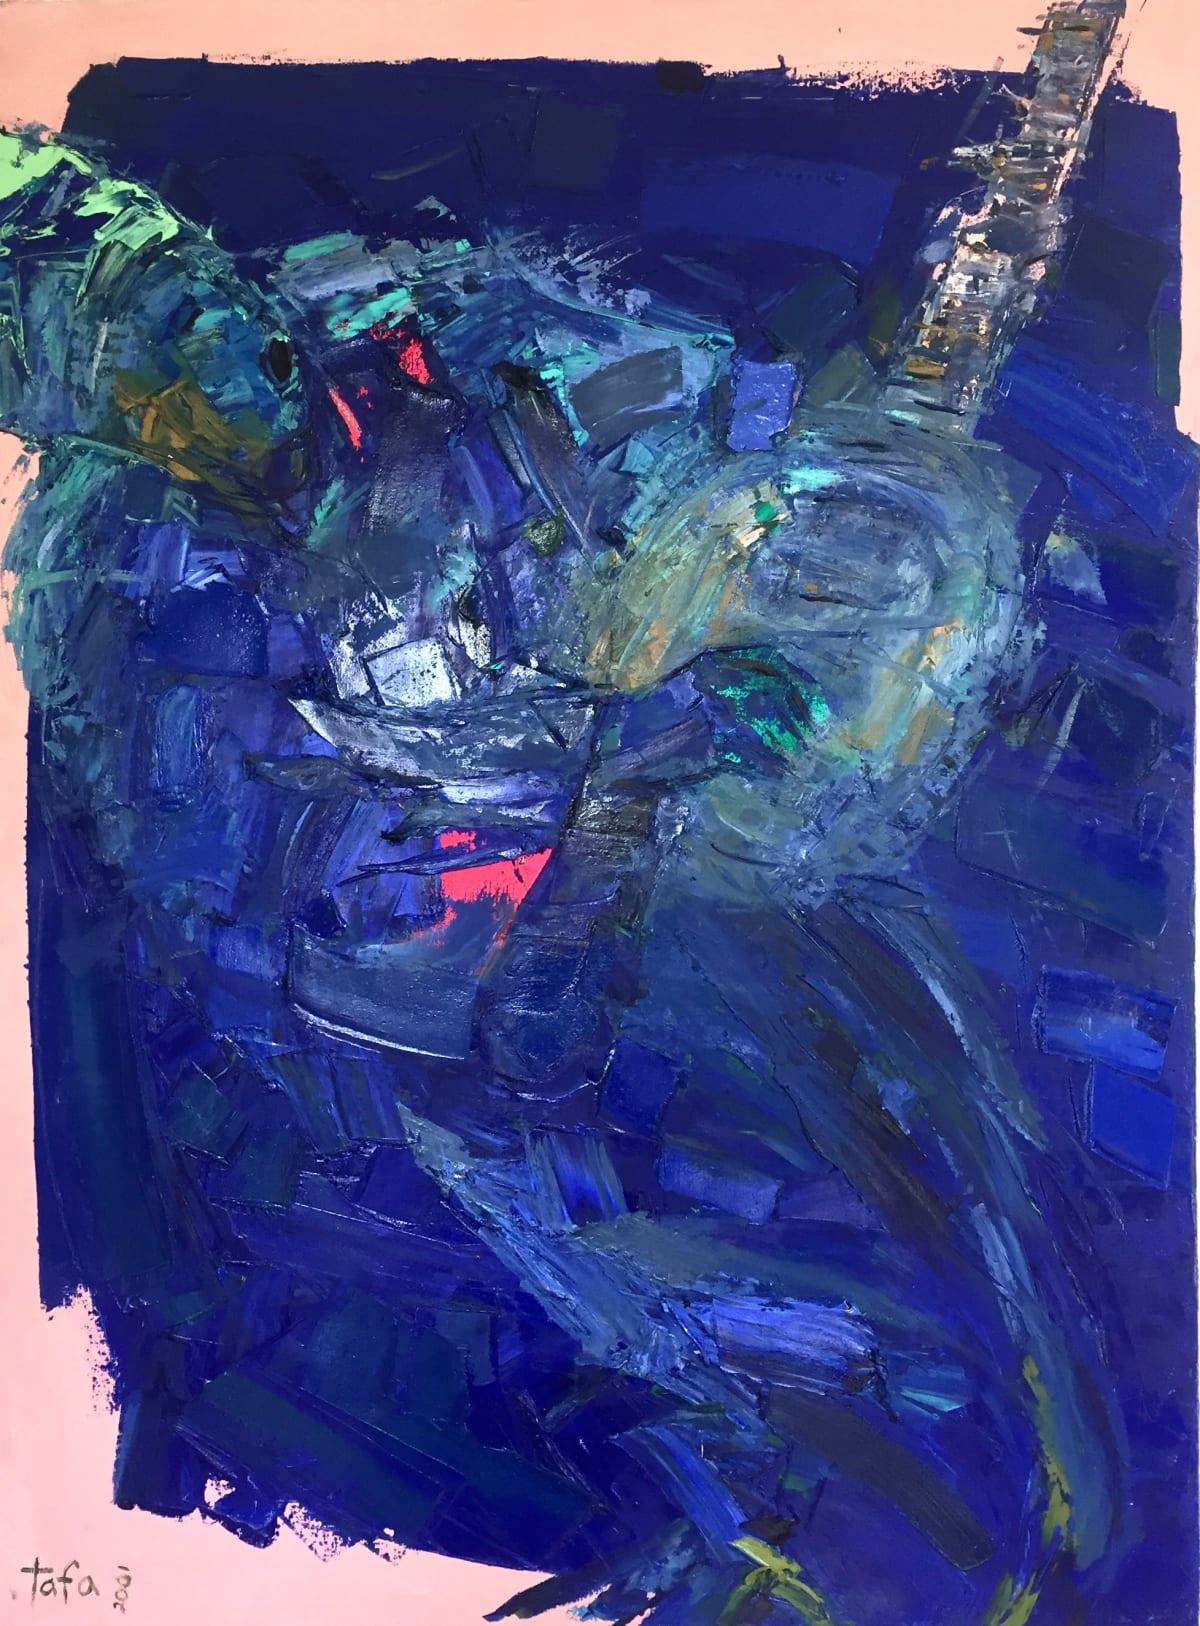 TAFA Banjo Blues III, 2001.0 Oil, Acrylic on Canvas 40 x 29 3/4